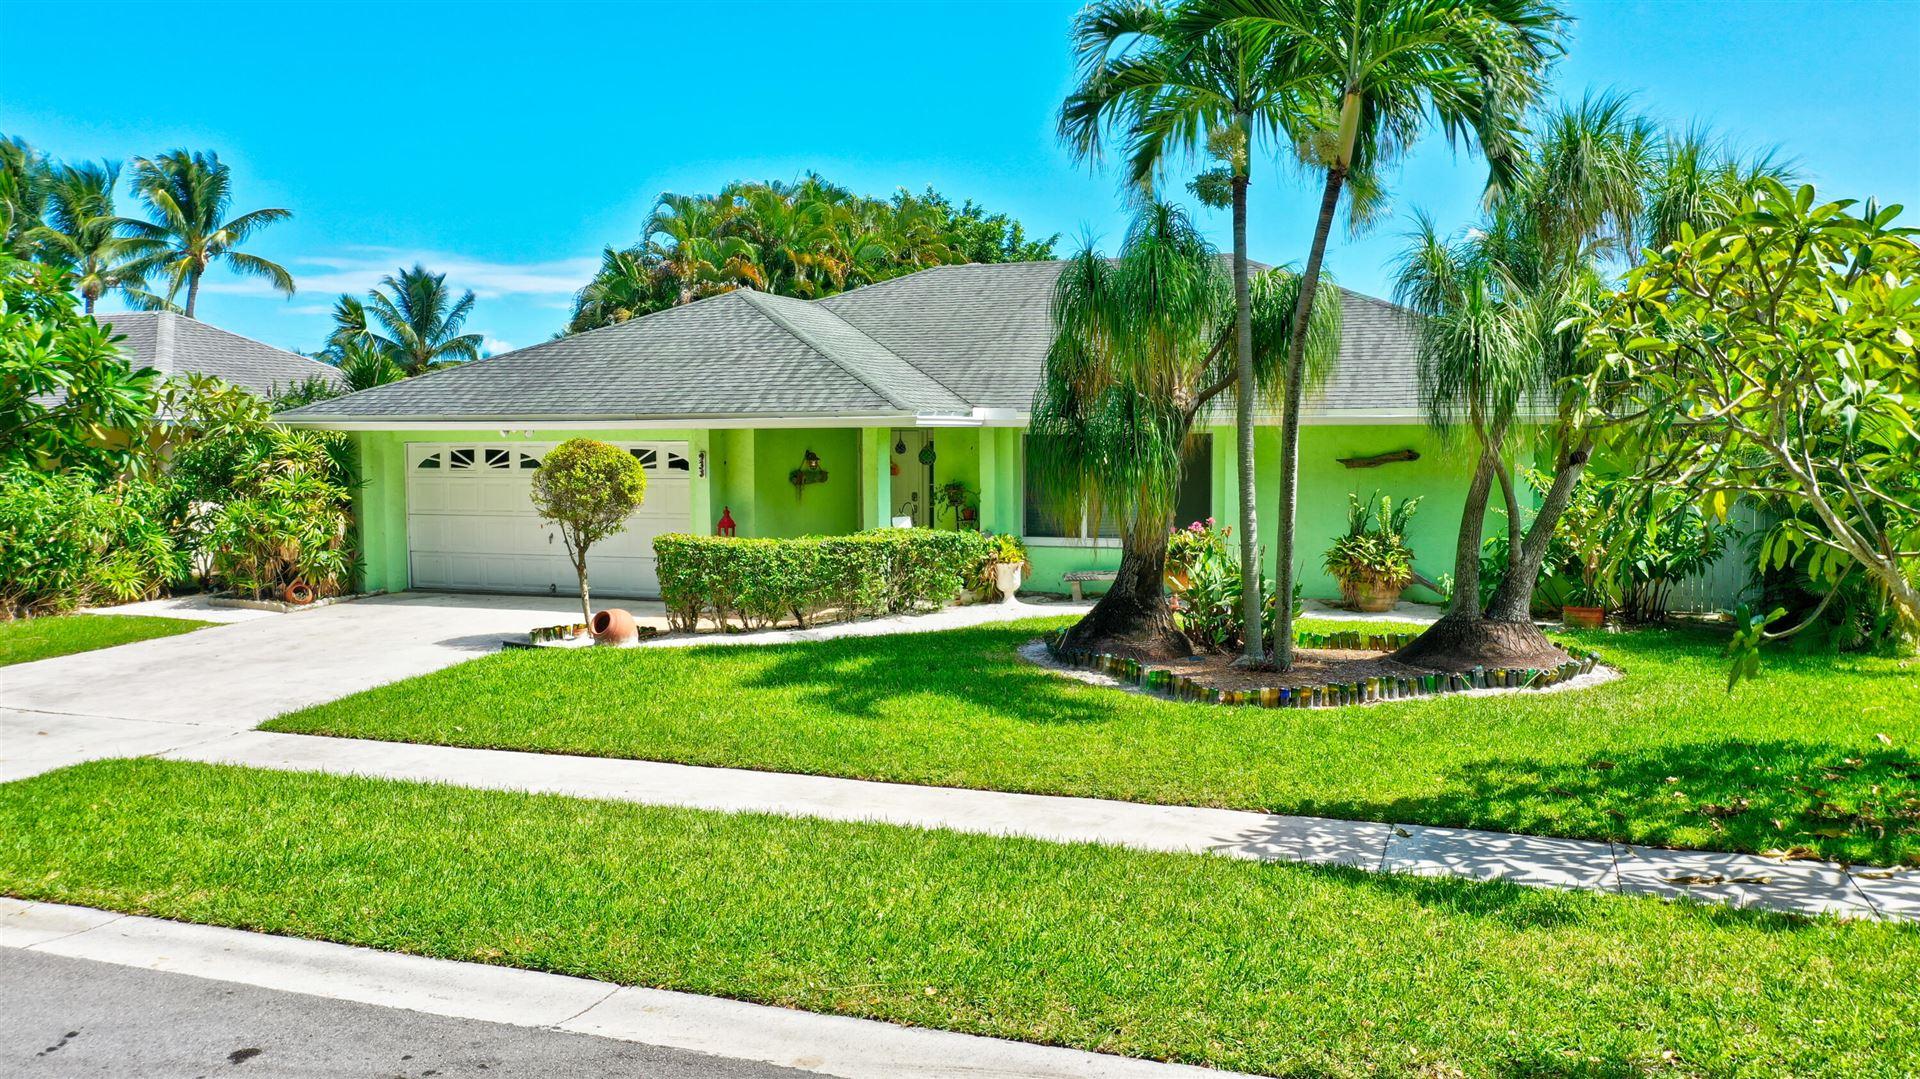 938 Flamango Lake Drive, West Palm Beach, FL 33406 - MLS#: RX-10751033